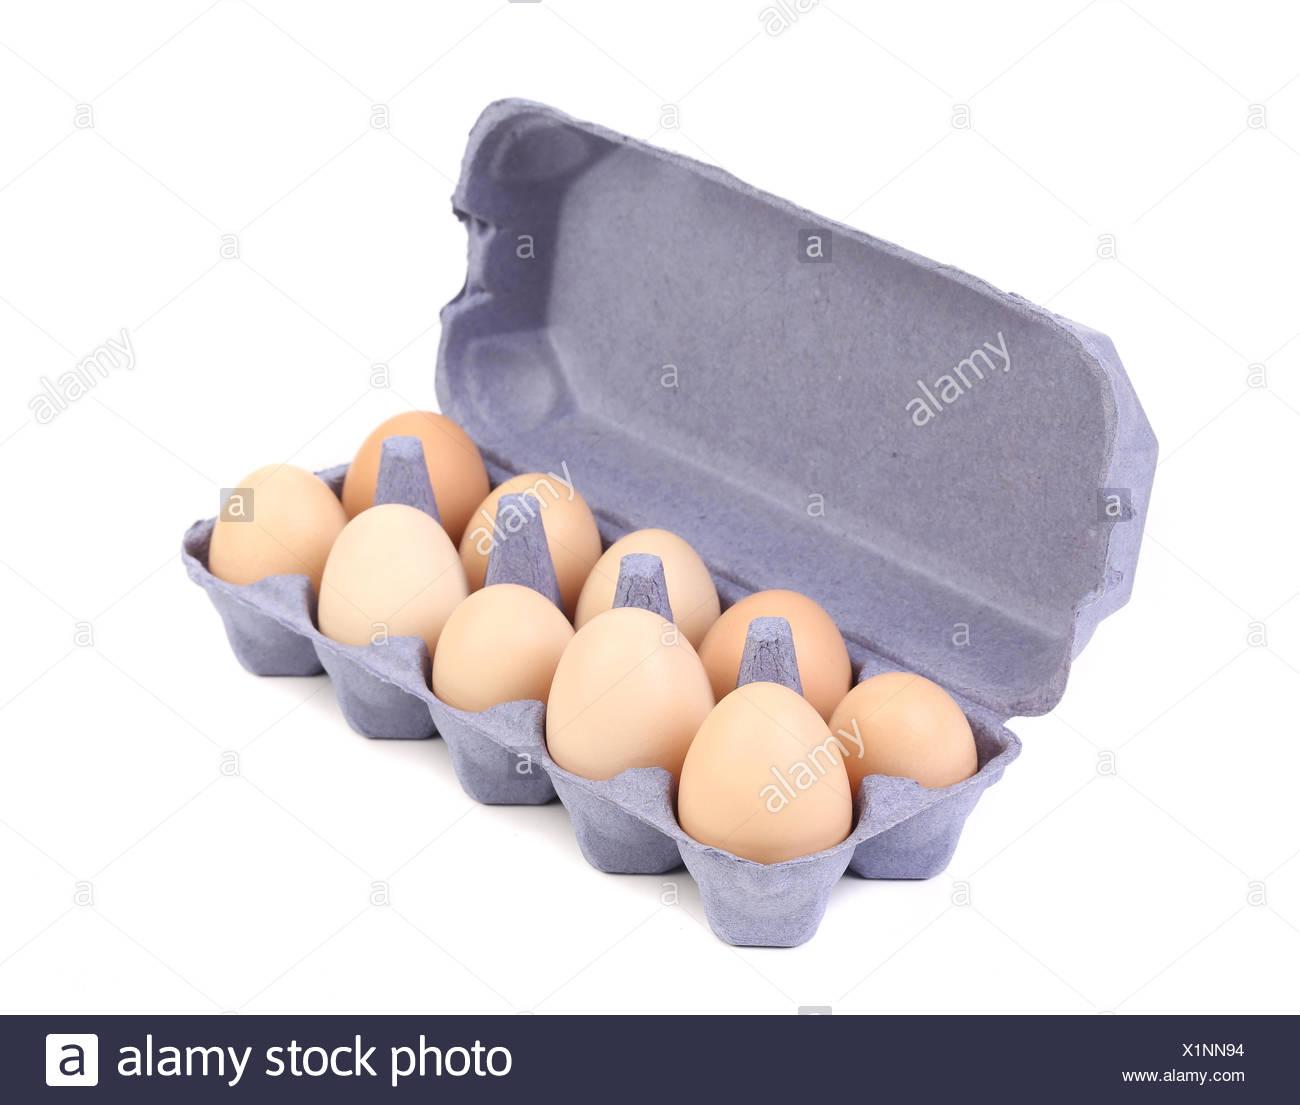 purple Cardboard egg box with ten  brown eggs - Stock Image